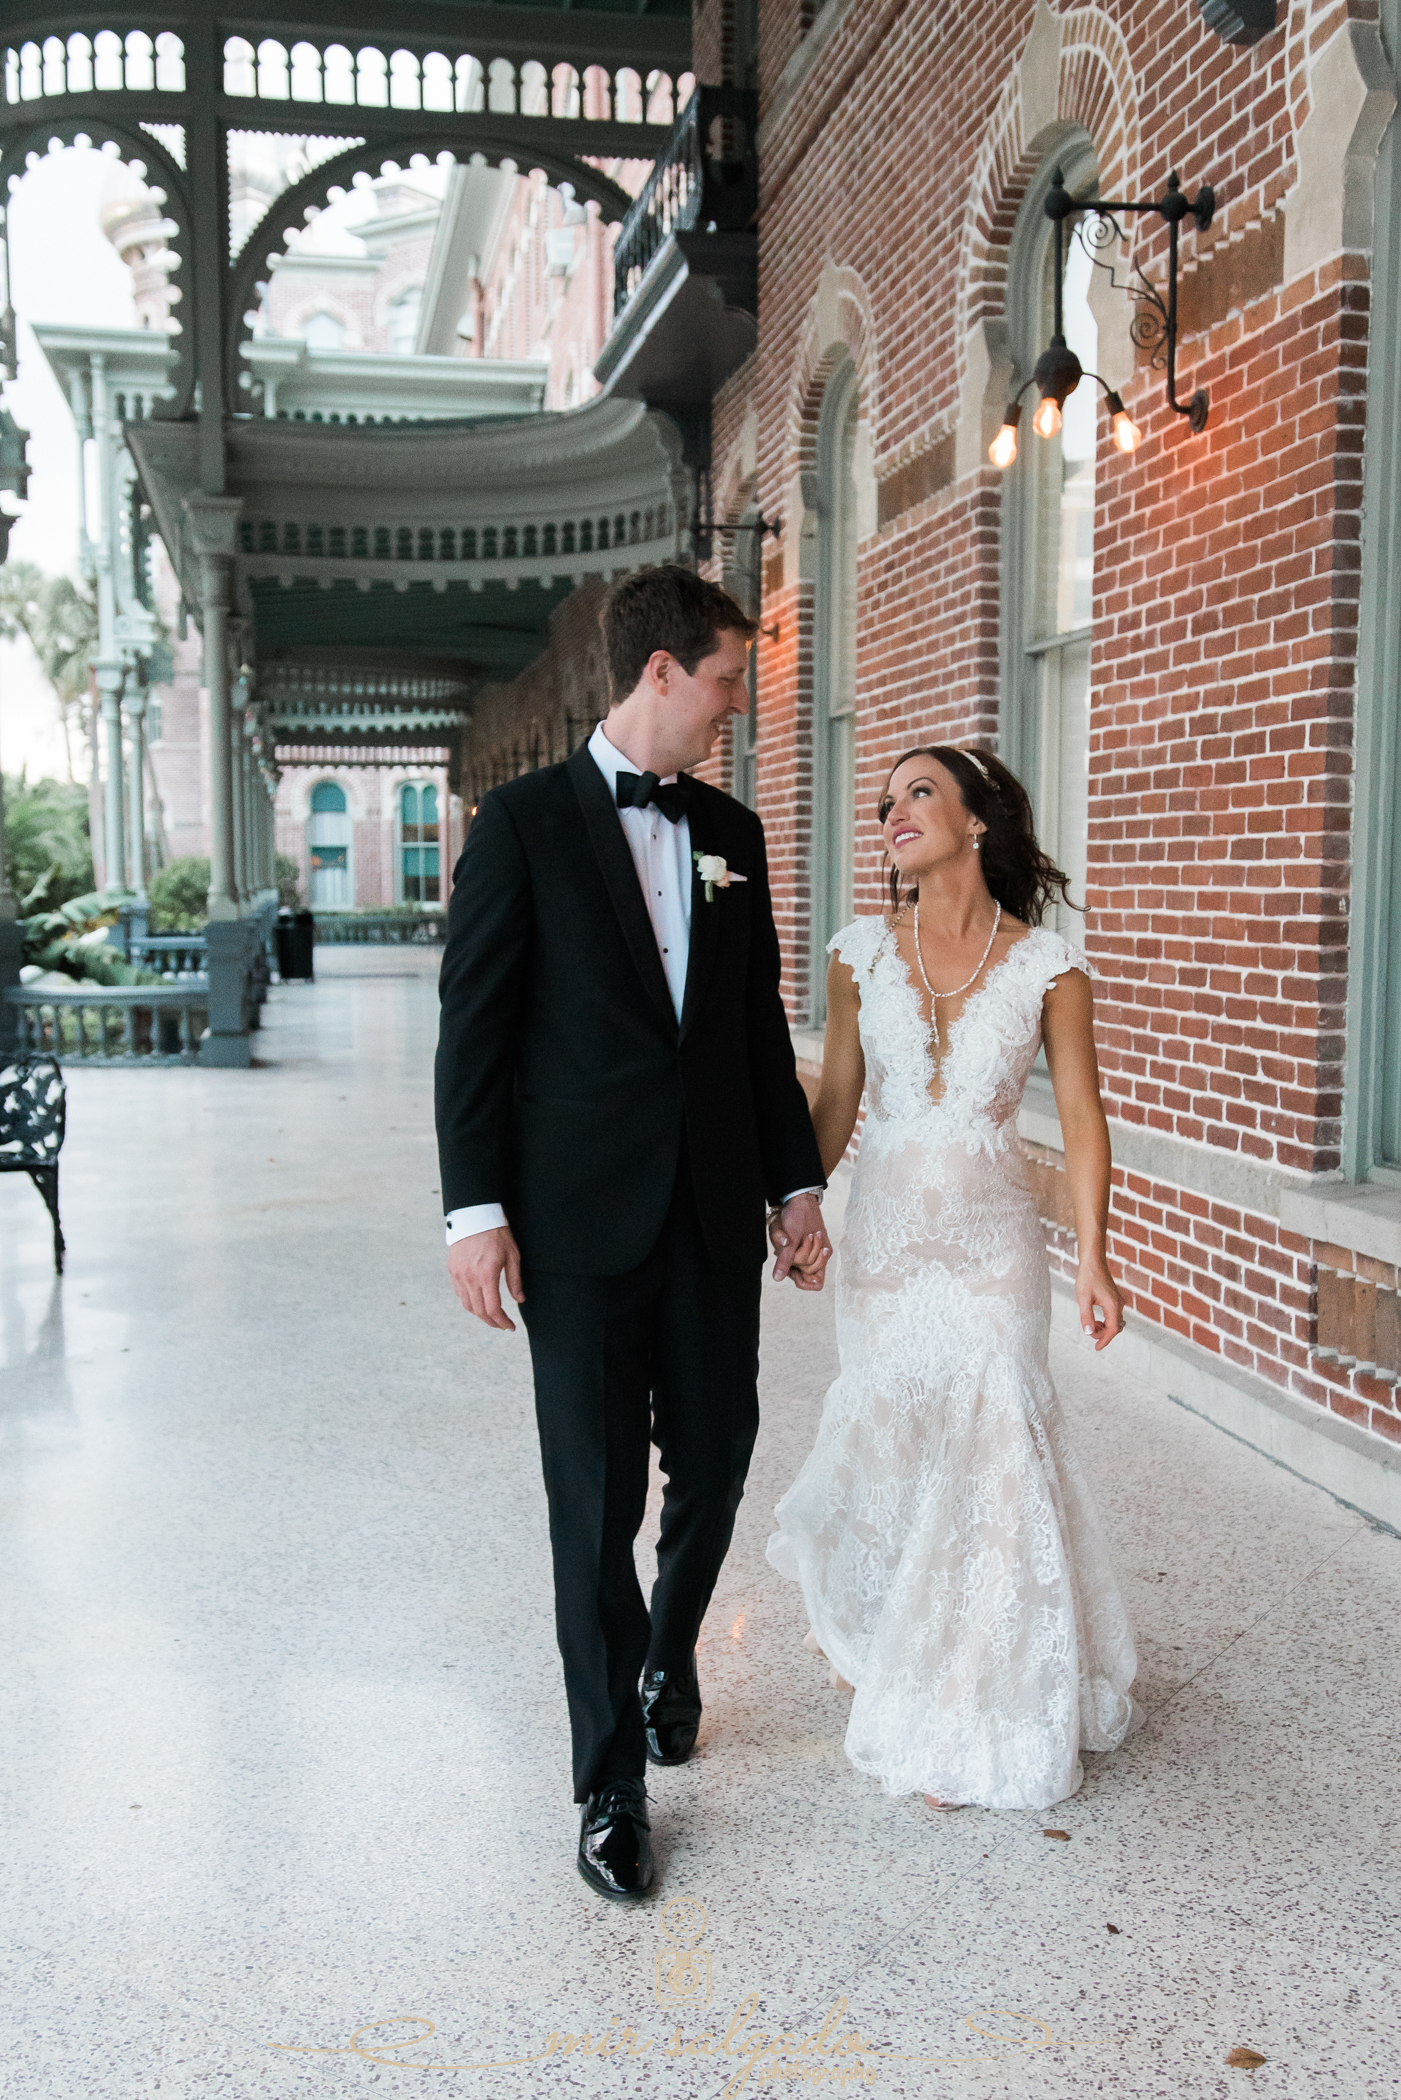 Tampa-wedding-photographer, University-of-Tampa-wedding